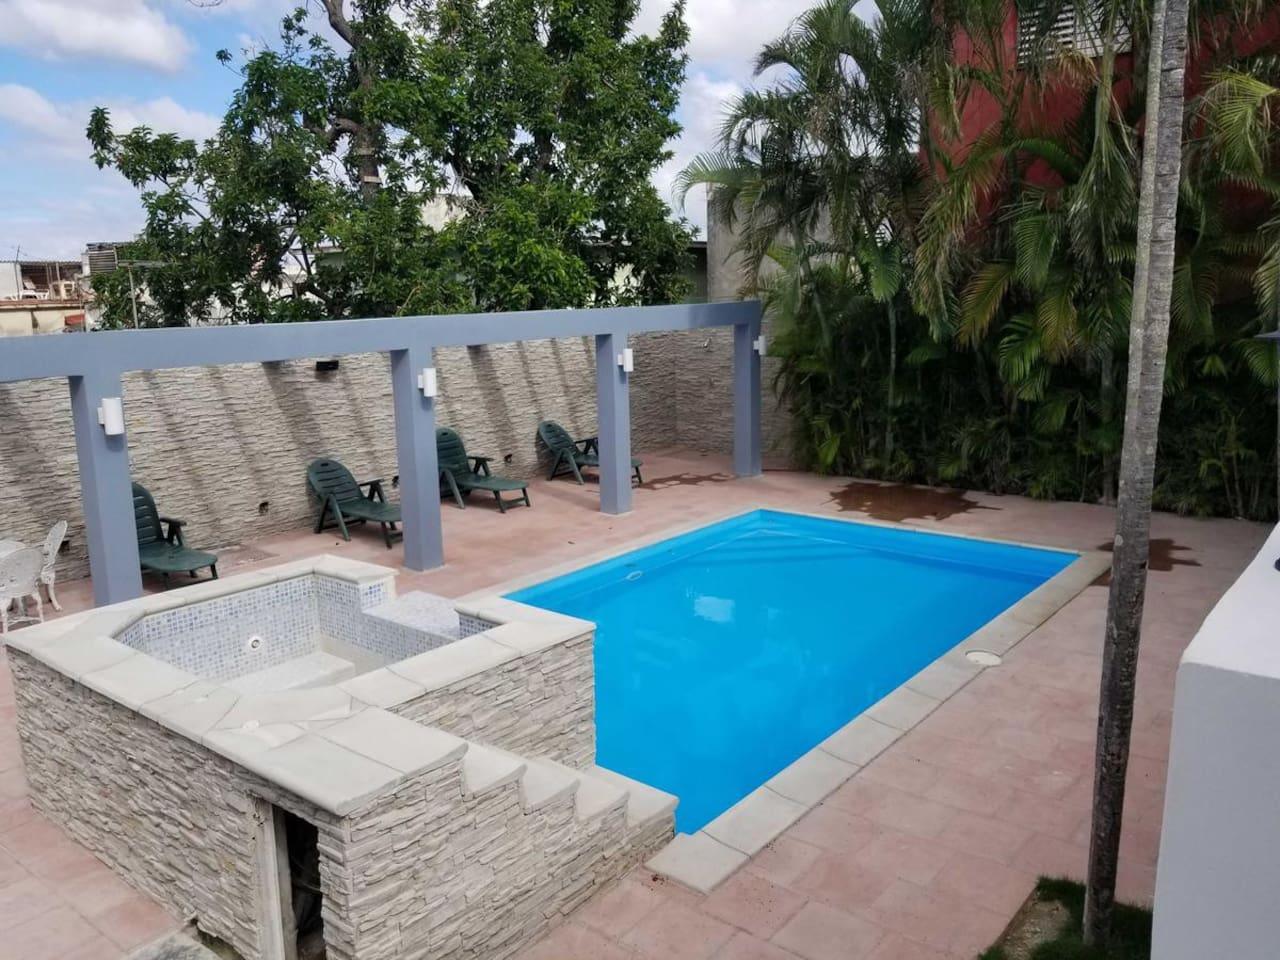 Villa Don Teto Suite & 8 Rooms: Great Havana View photo 16140860